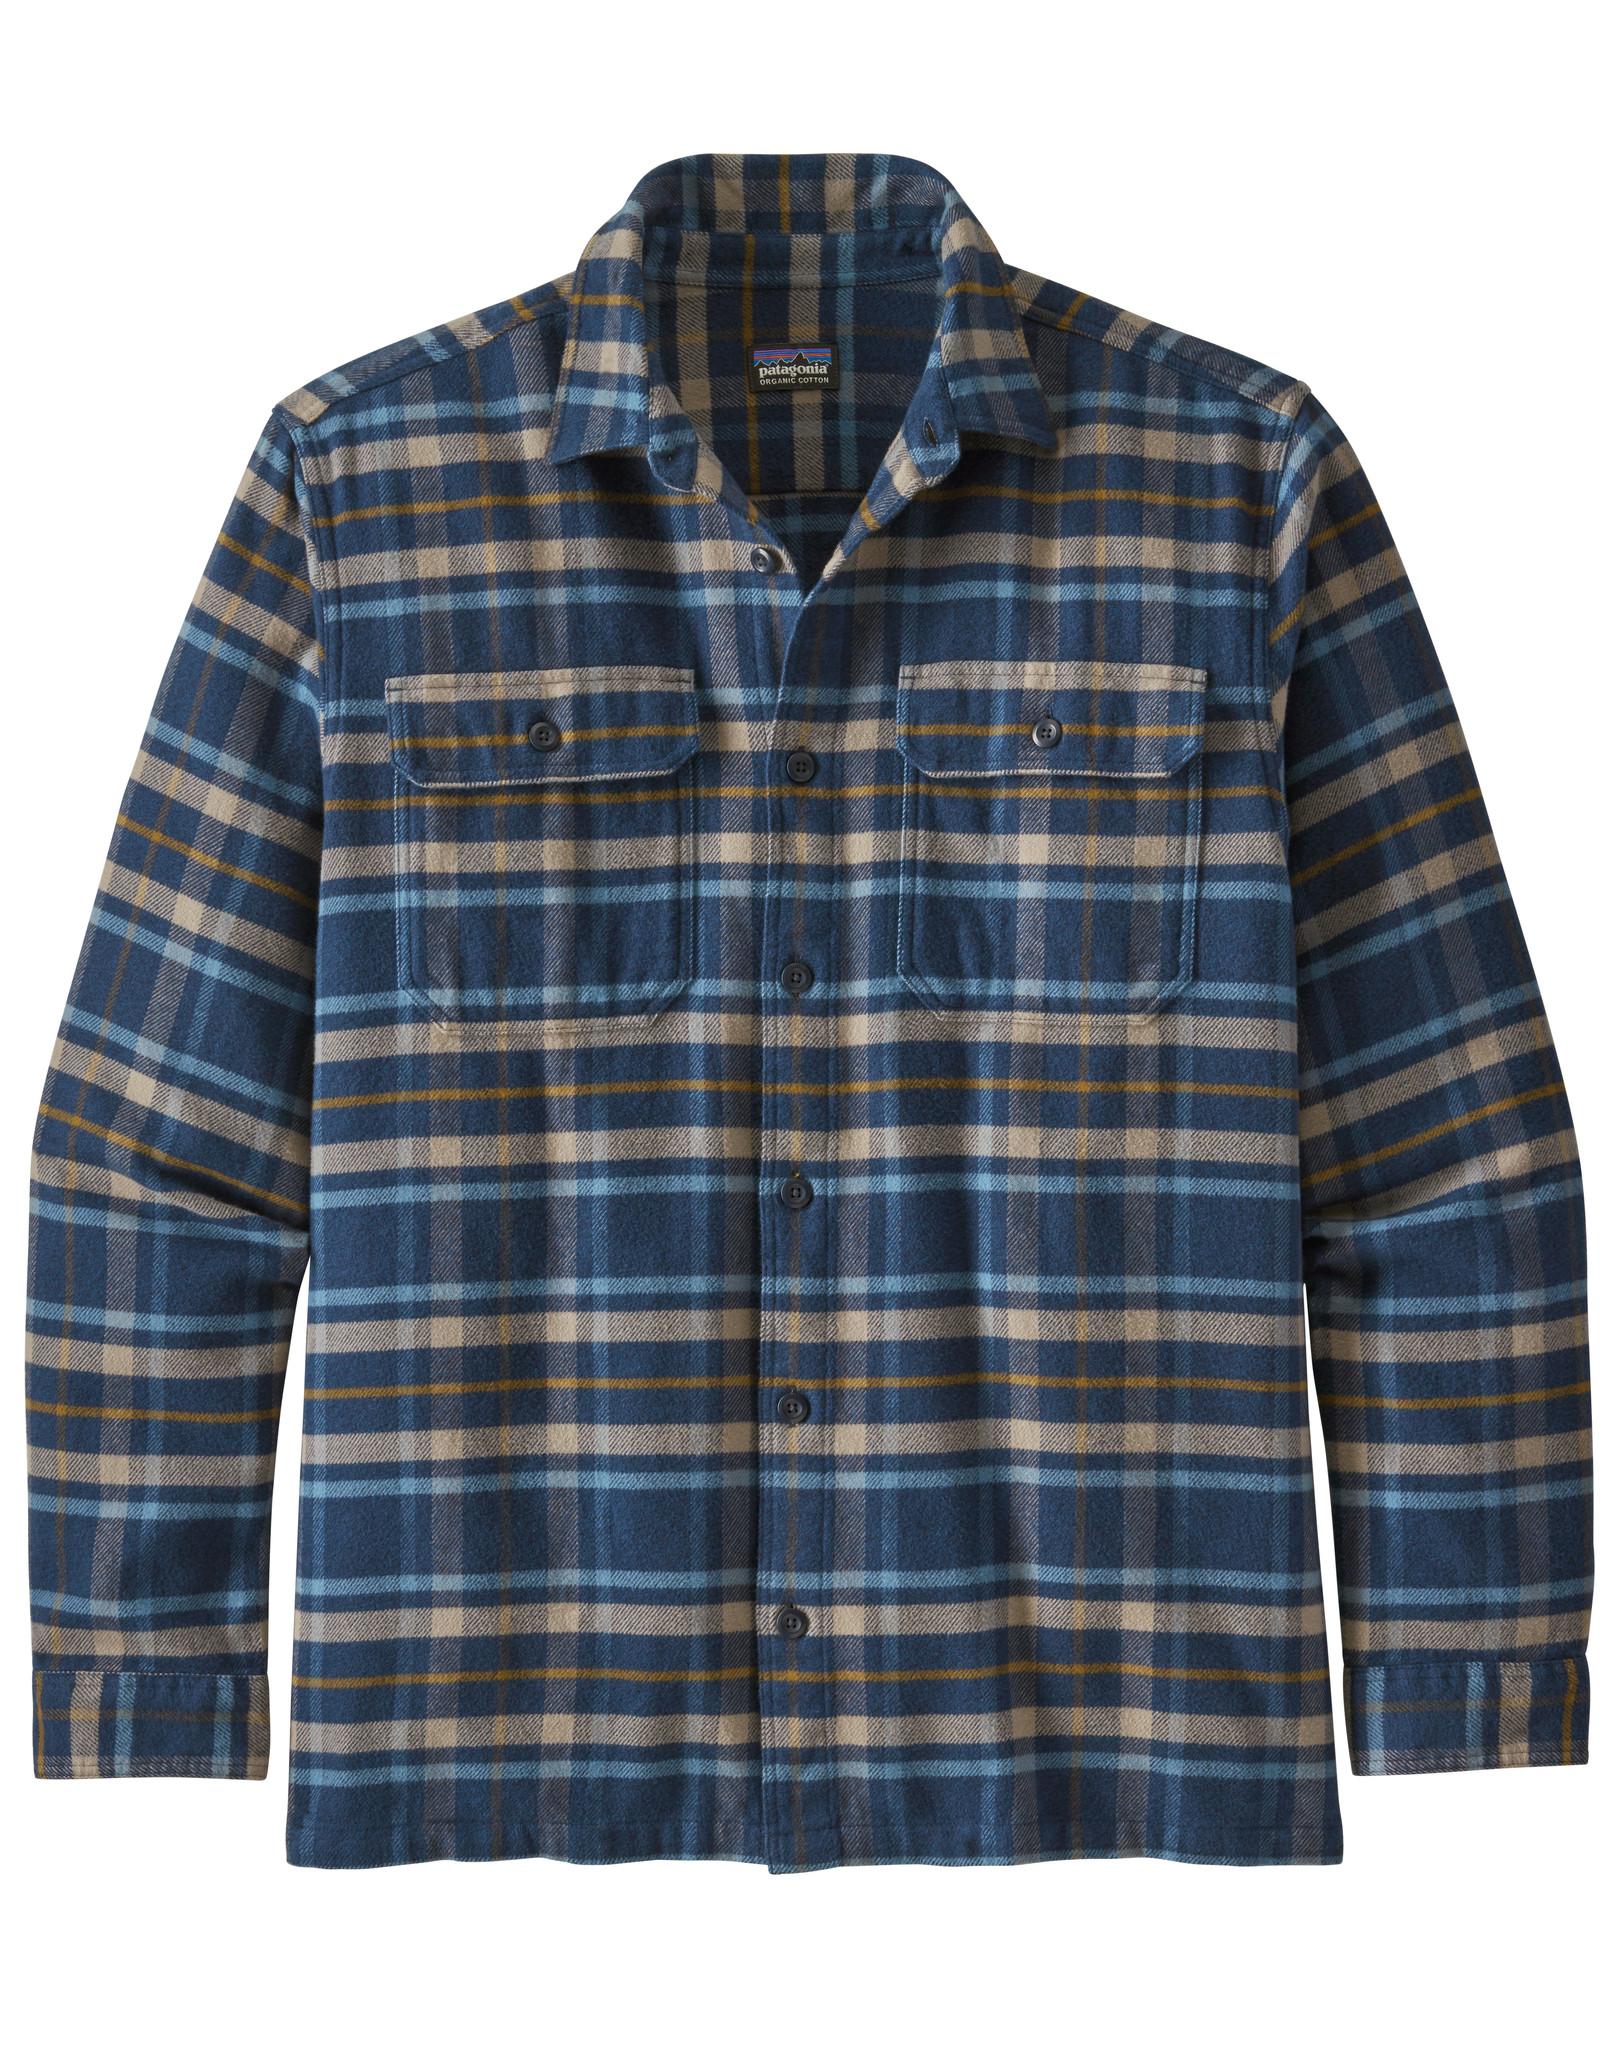 patagonia Fjord Flannel shirt 53947